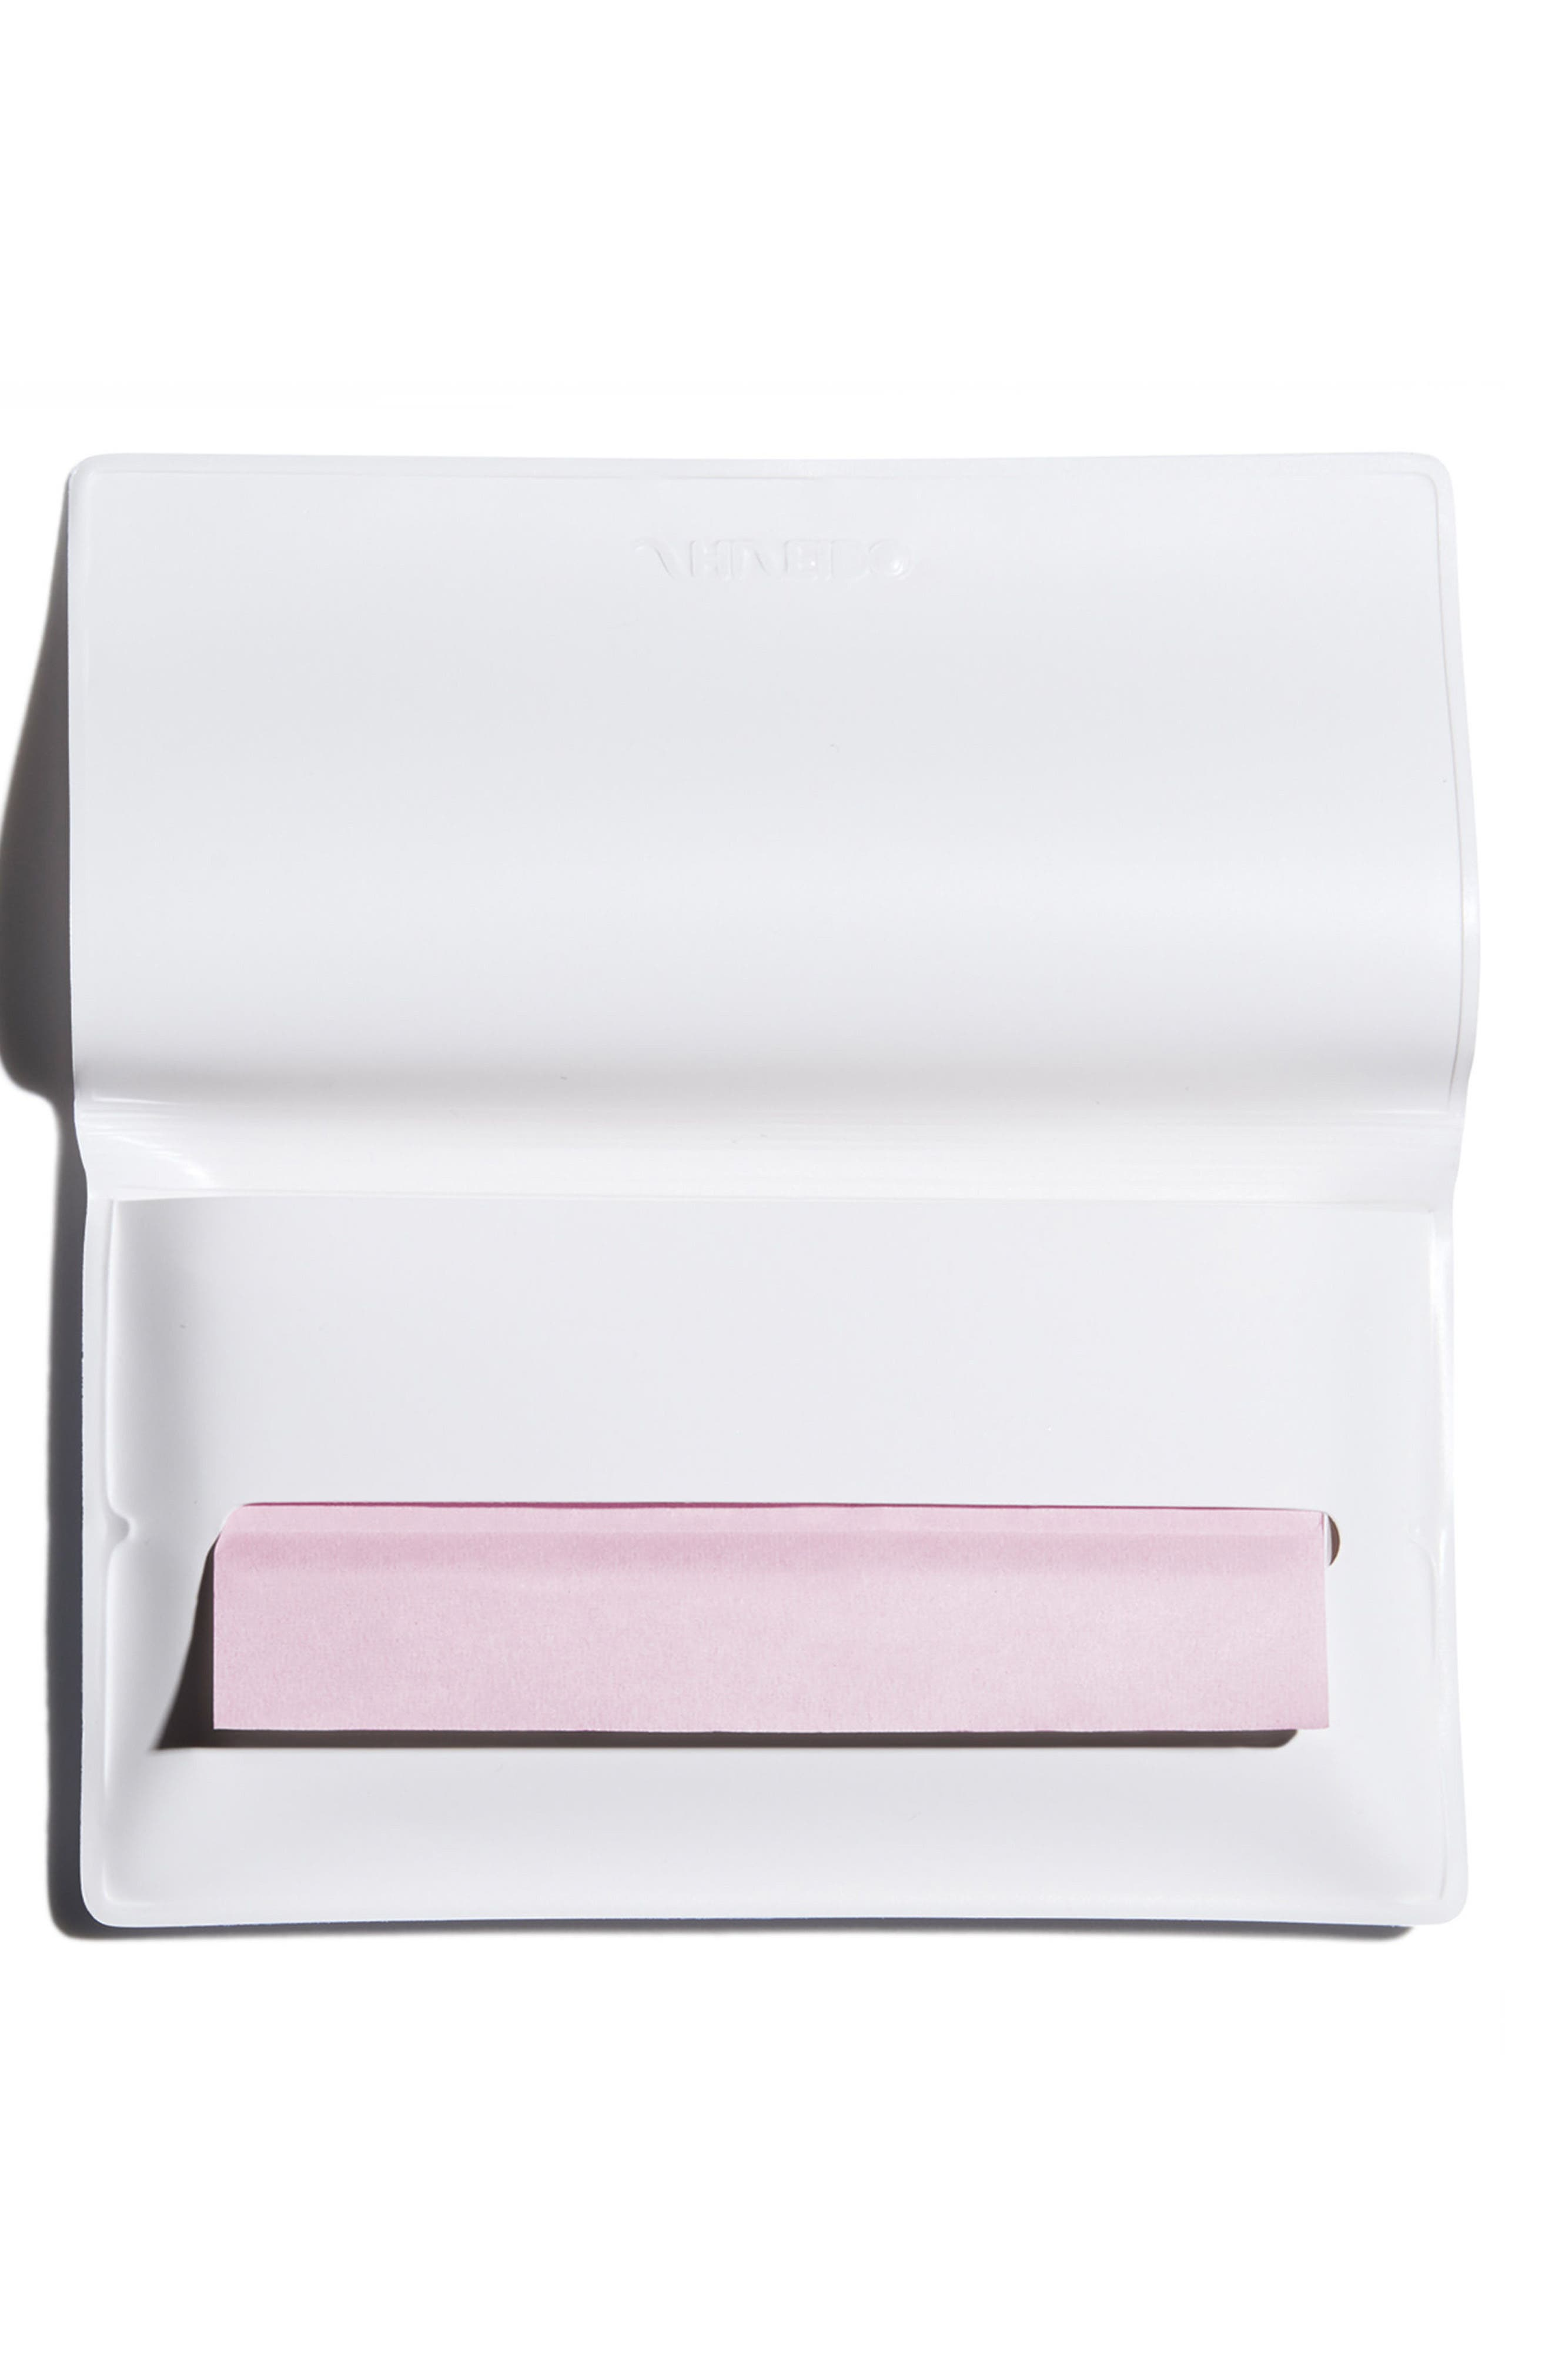 Oil-Control Blotting Paper,                             Main thumbnail 1, color,                             No Color